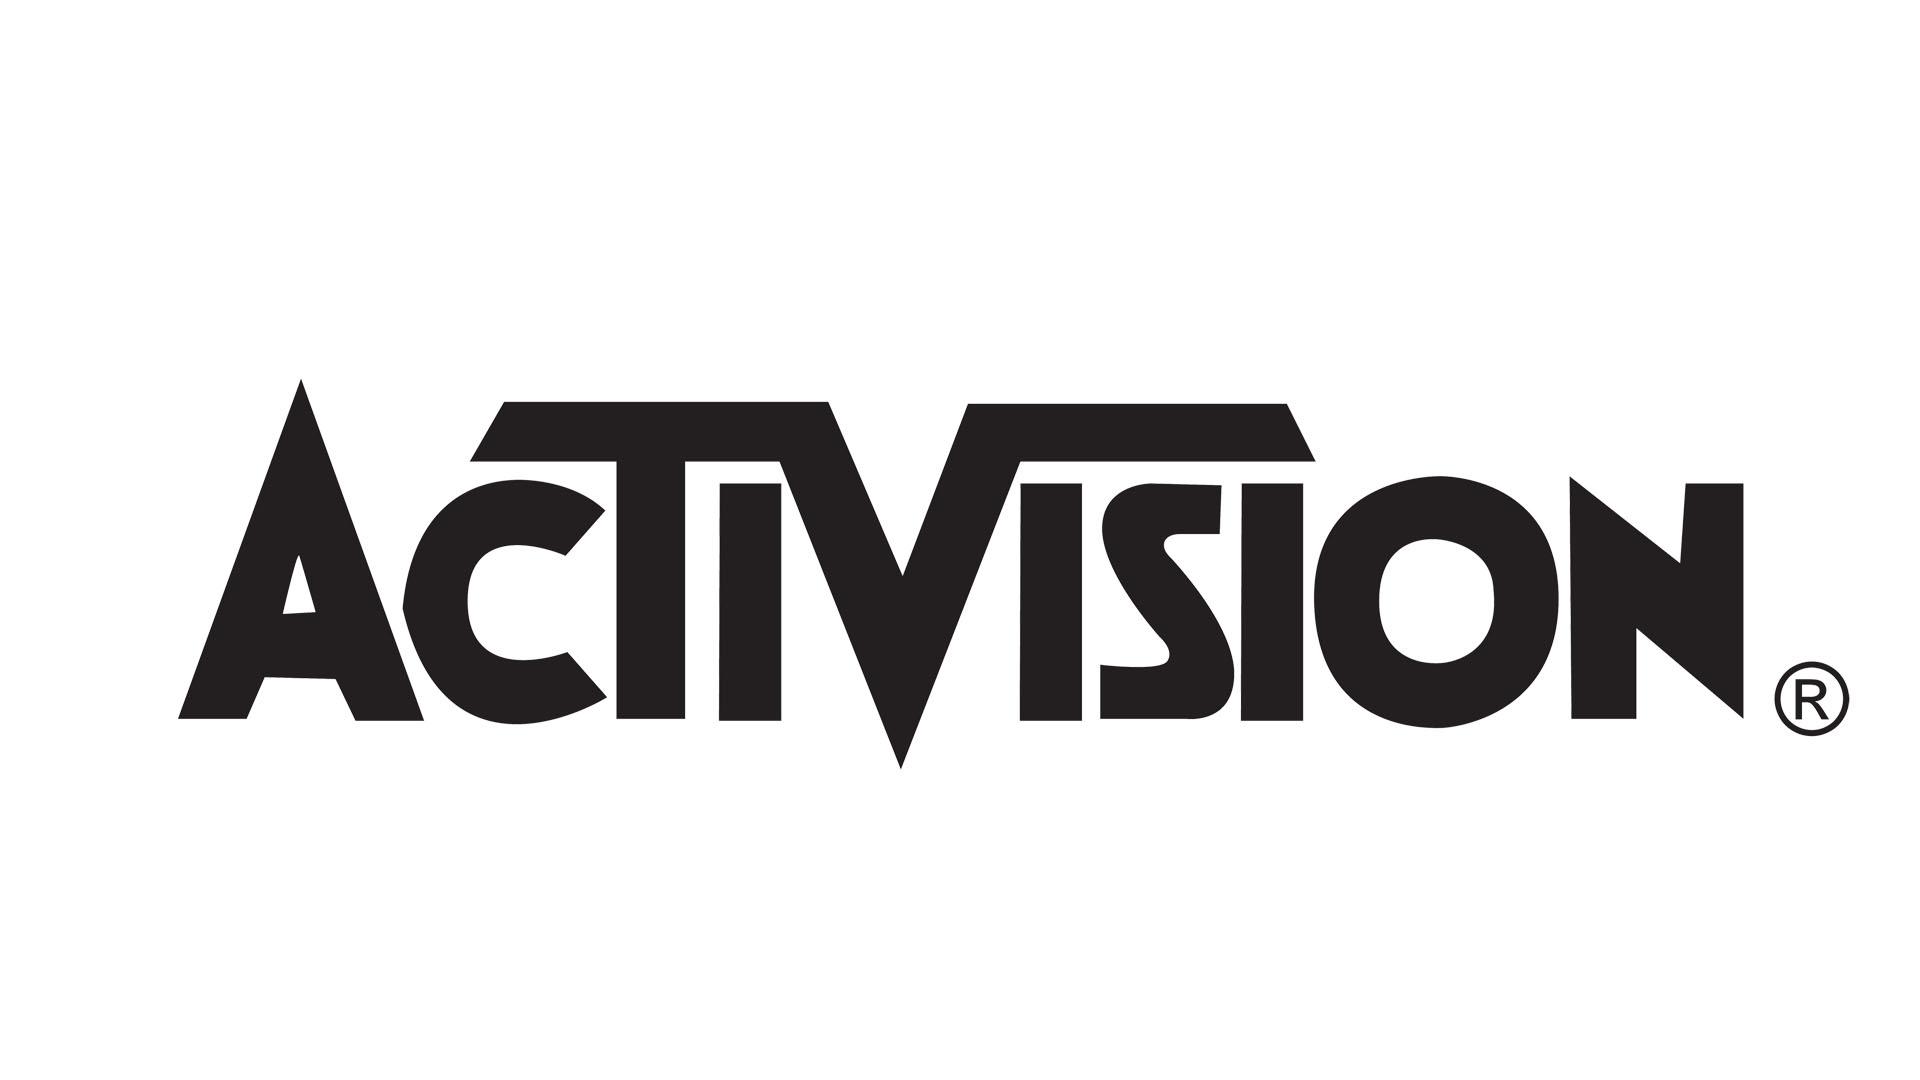 Activision Blizzard заработала за три месяца больше миллиарда долларов на микротранзакциях и DLC